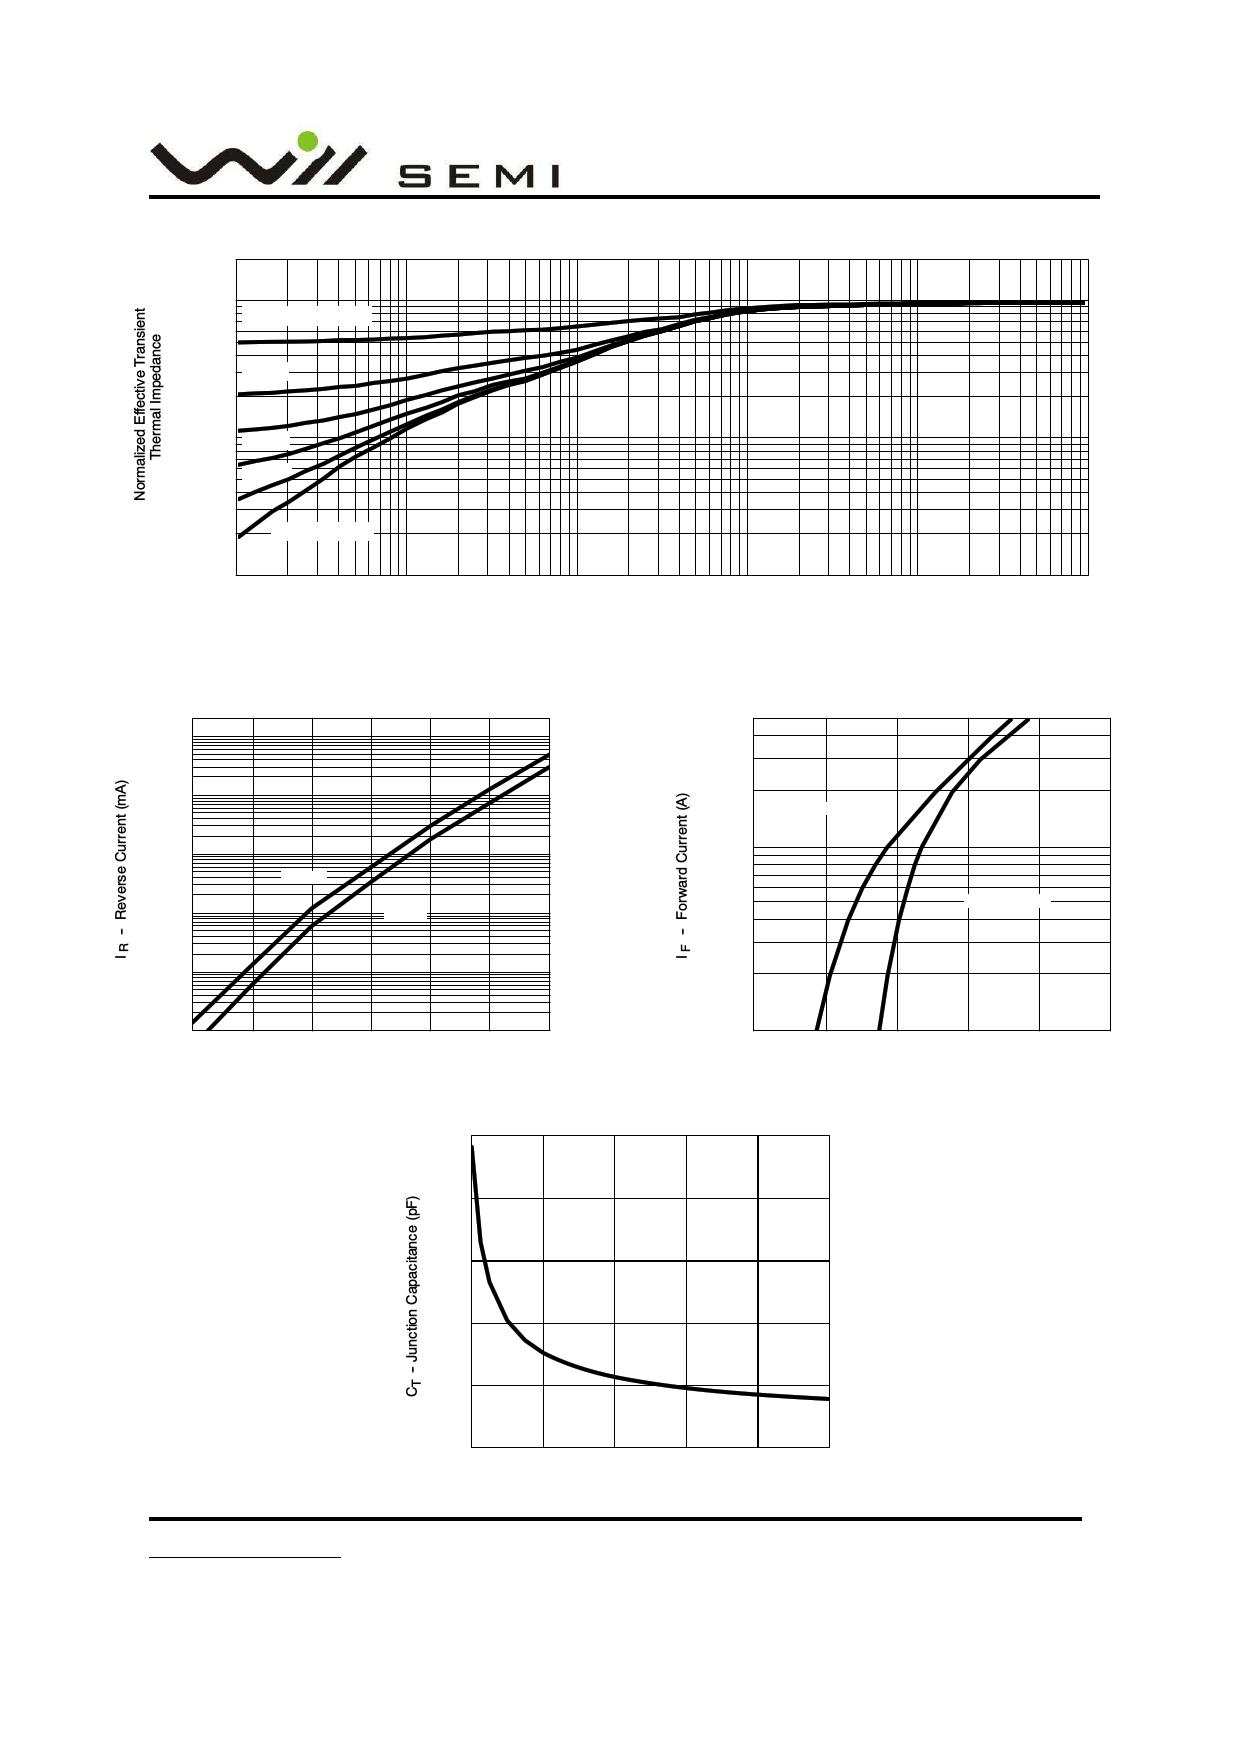 WPM2005 pdf, arduino